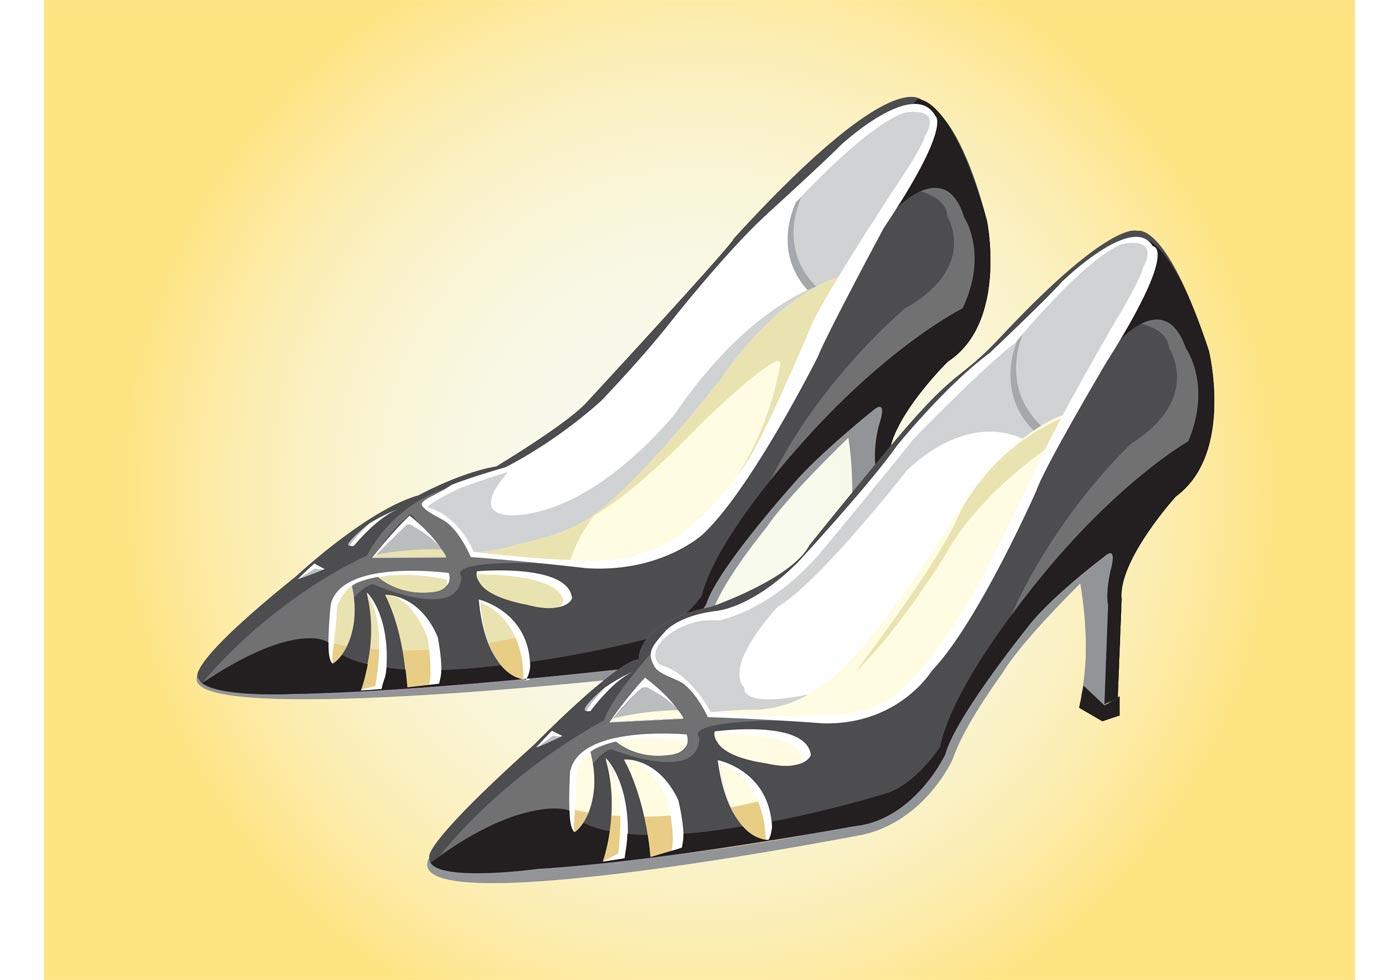 Elegant Shoes Download Free Vector Art Stock Graphics